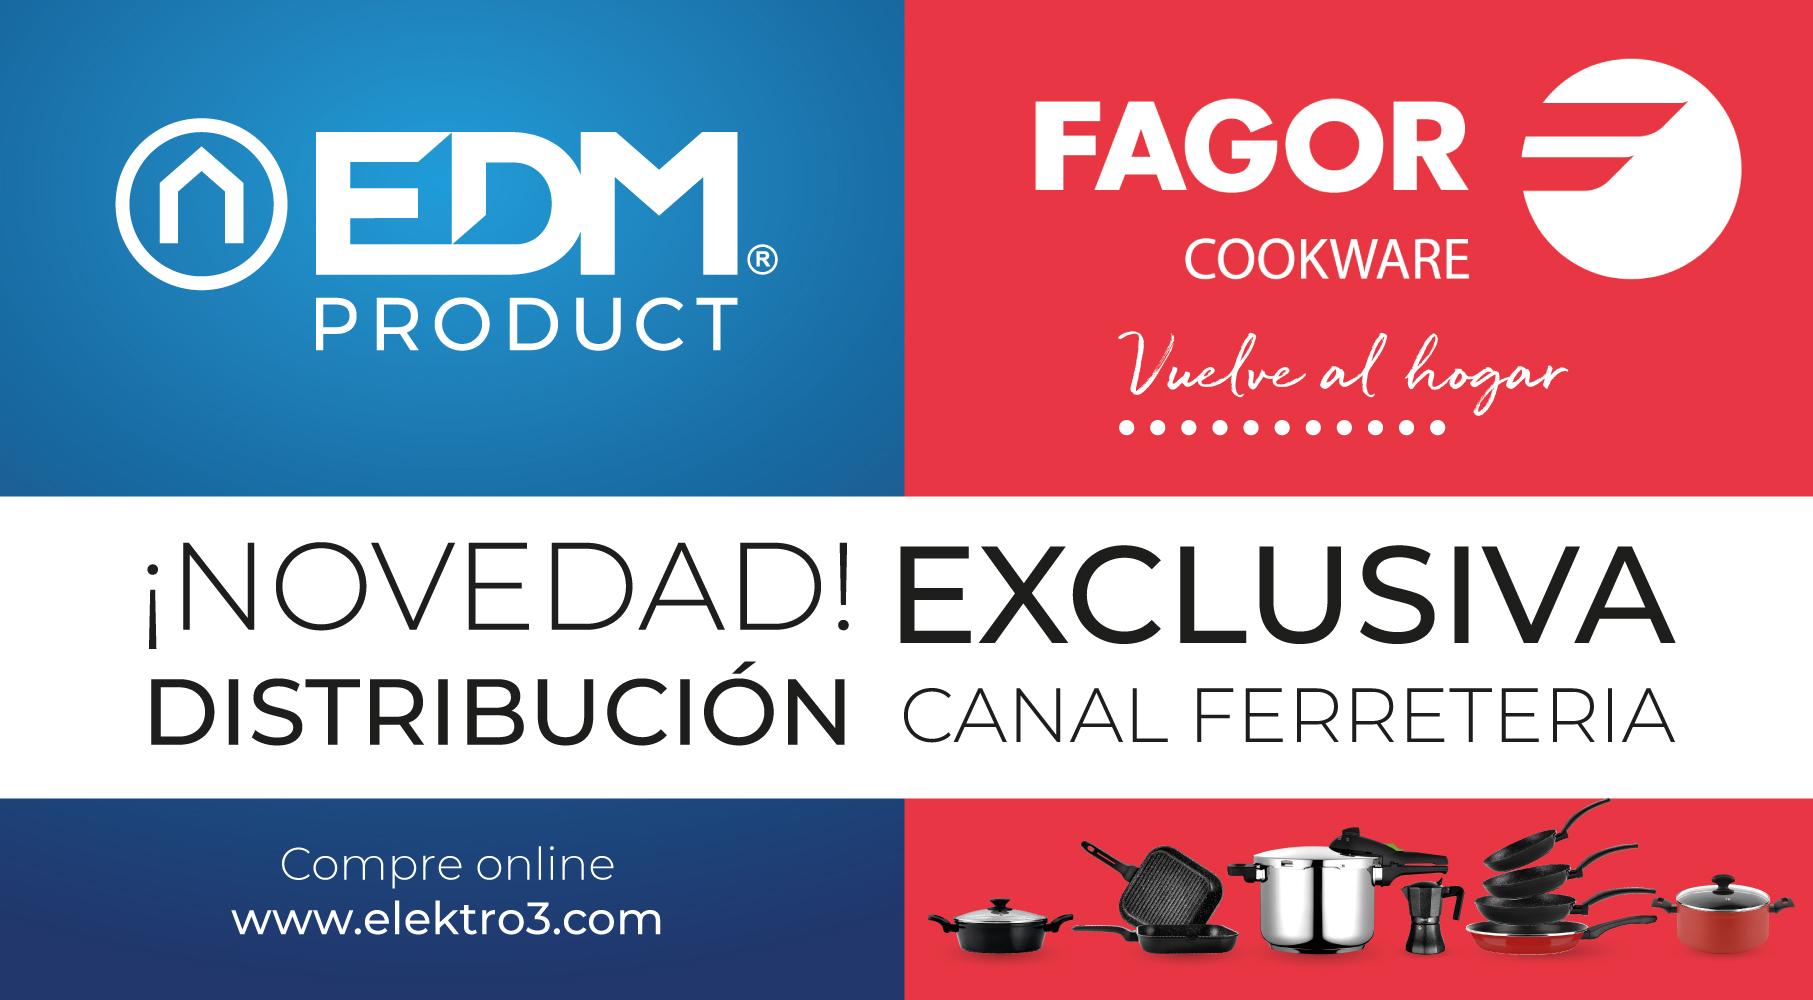 Novo acordo comercial Fagor - Elektro3 - EDM